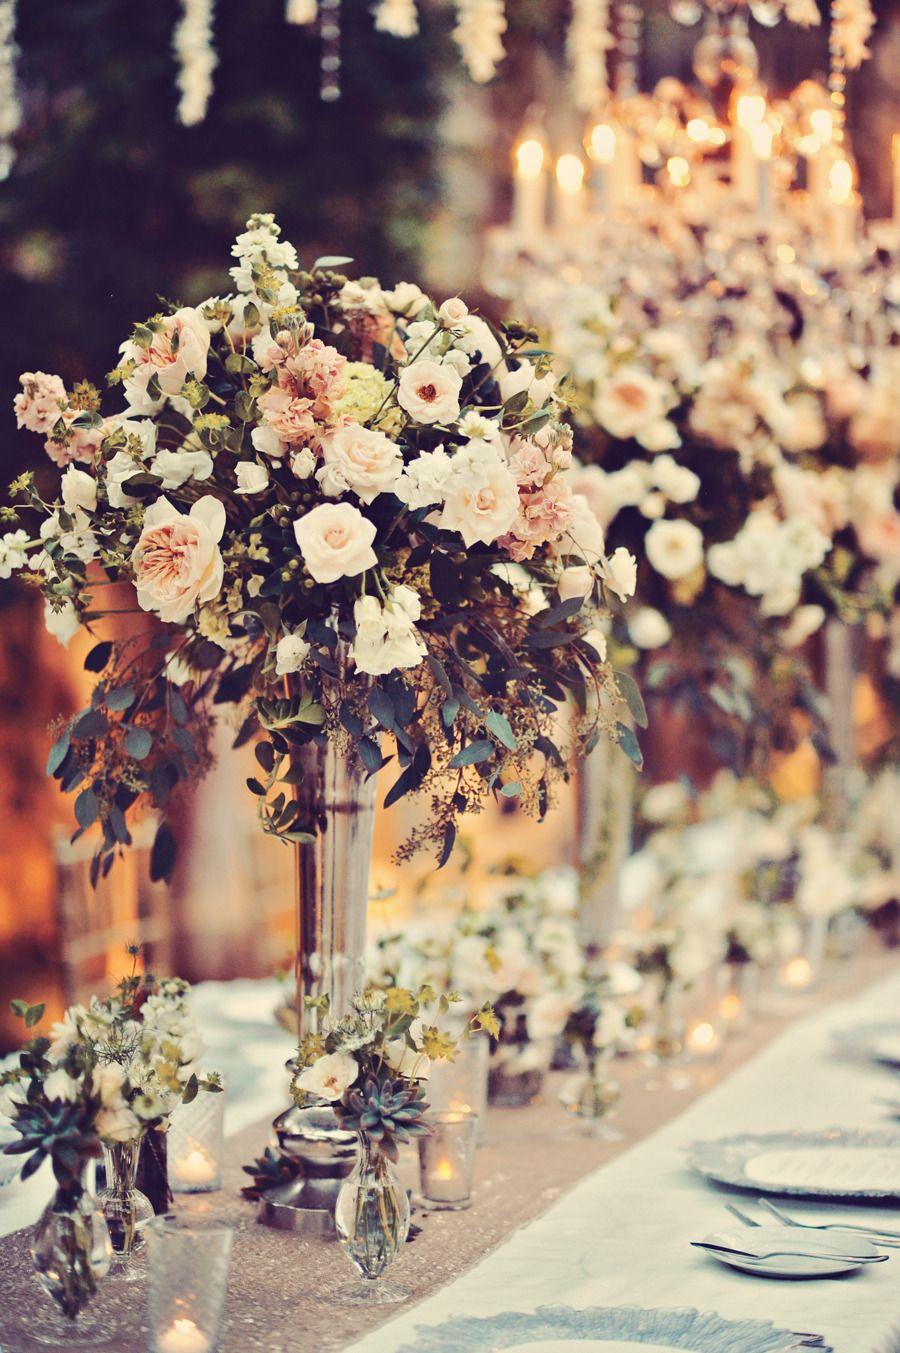 Photography: Tamiz Photography - www.tamizphotography.com  Read More: http://www.stylemepretty.com/2014/08/27/glamorous-maui-destination-wedding/